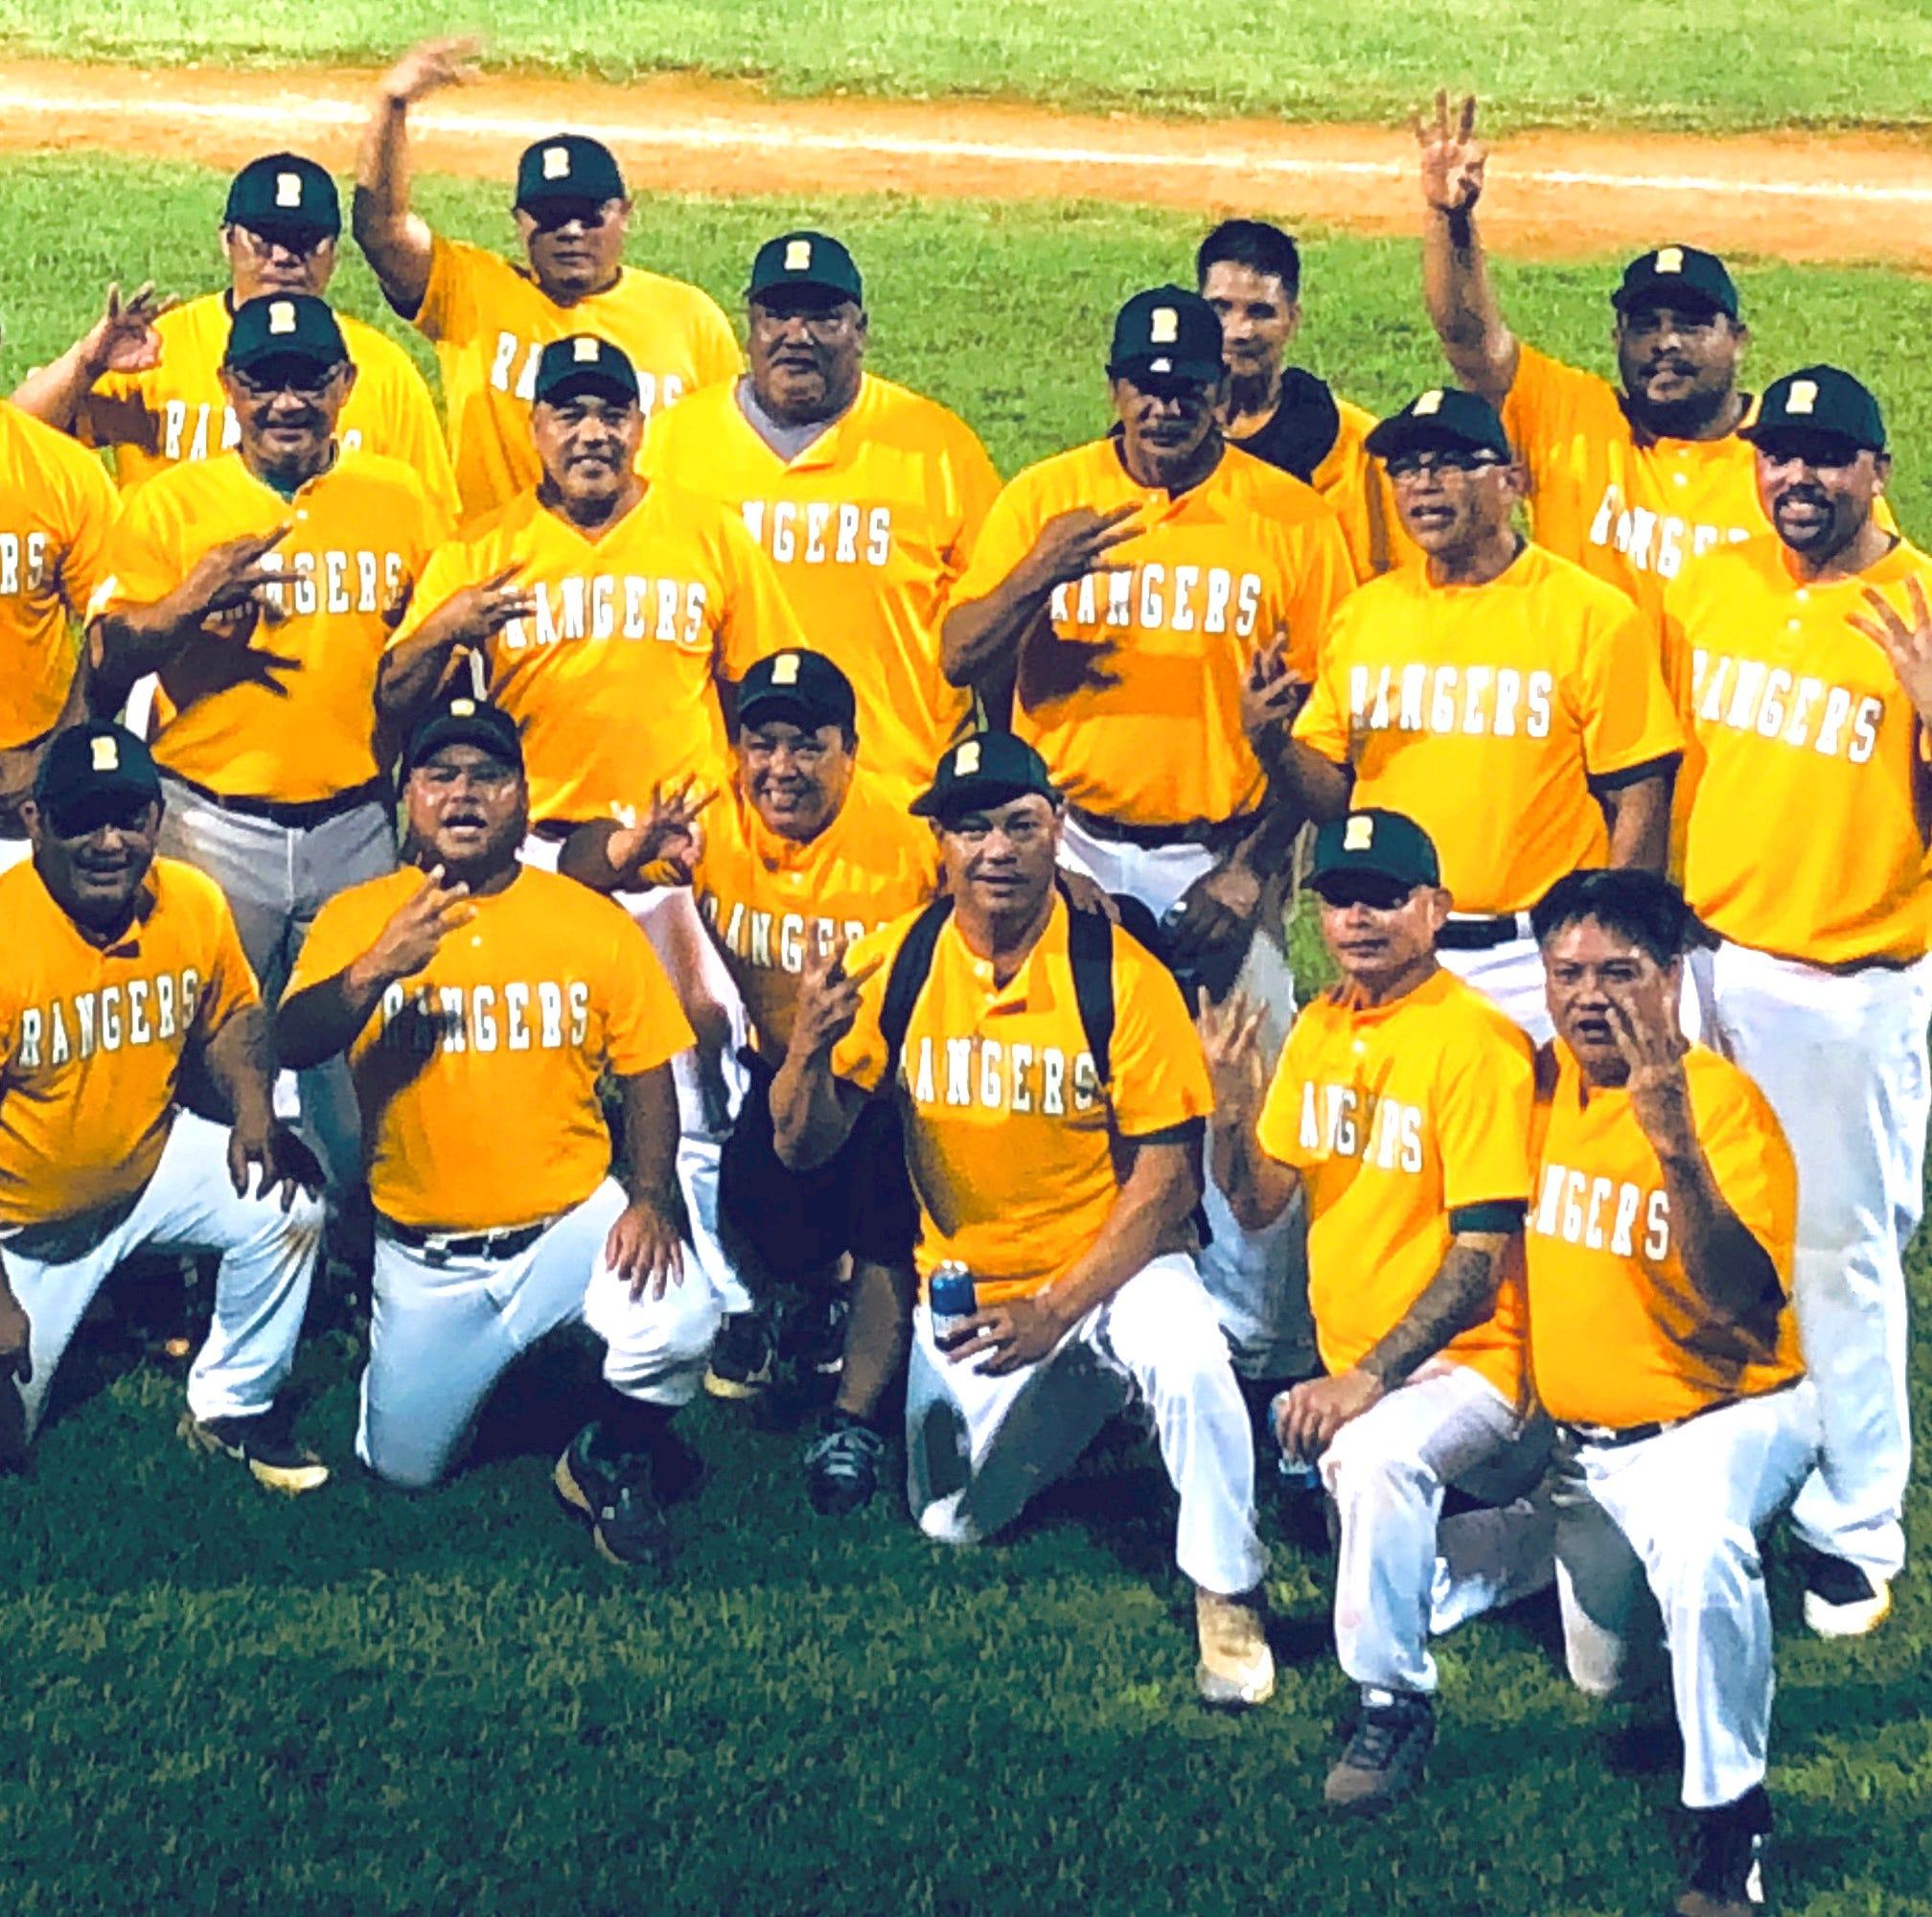 Southern Rangers take home baseball championship title